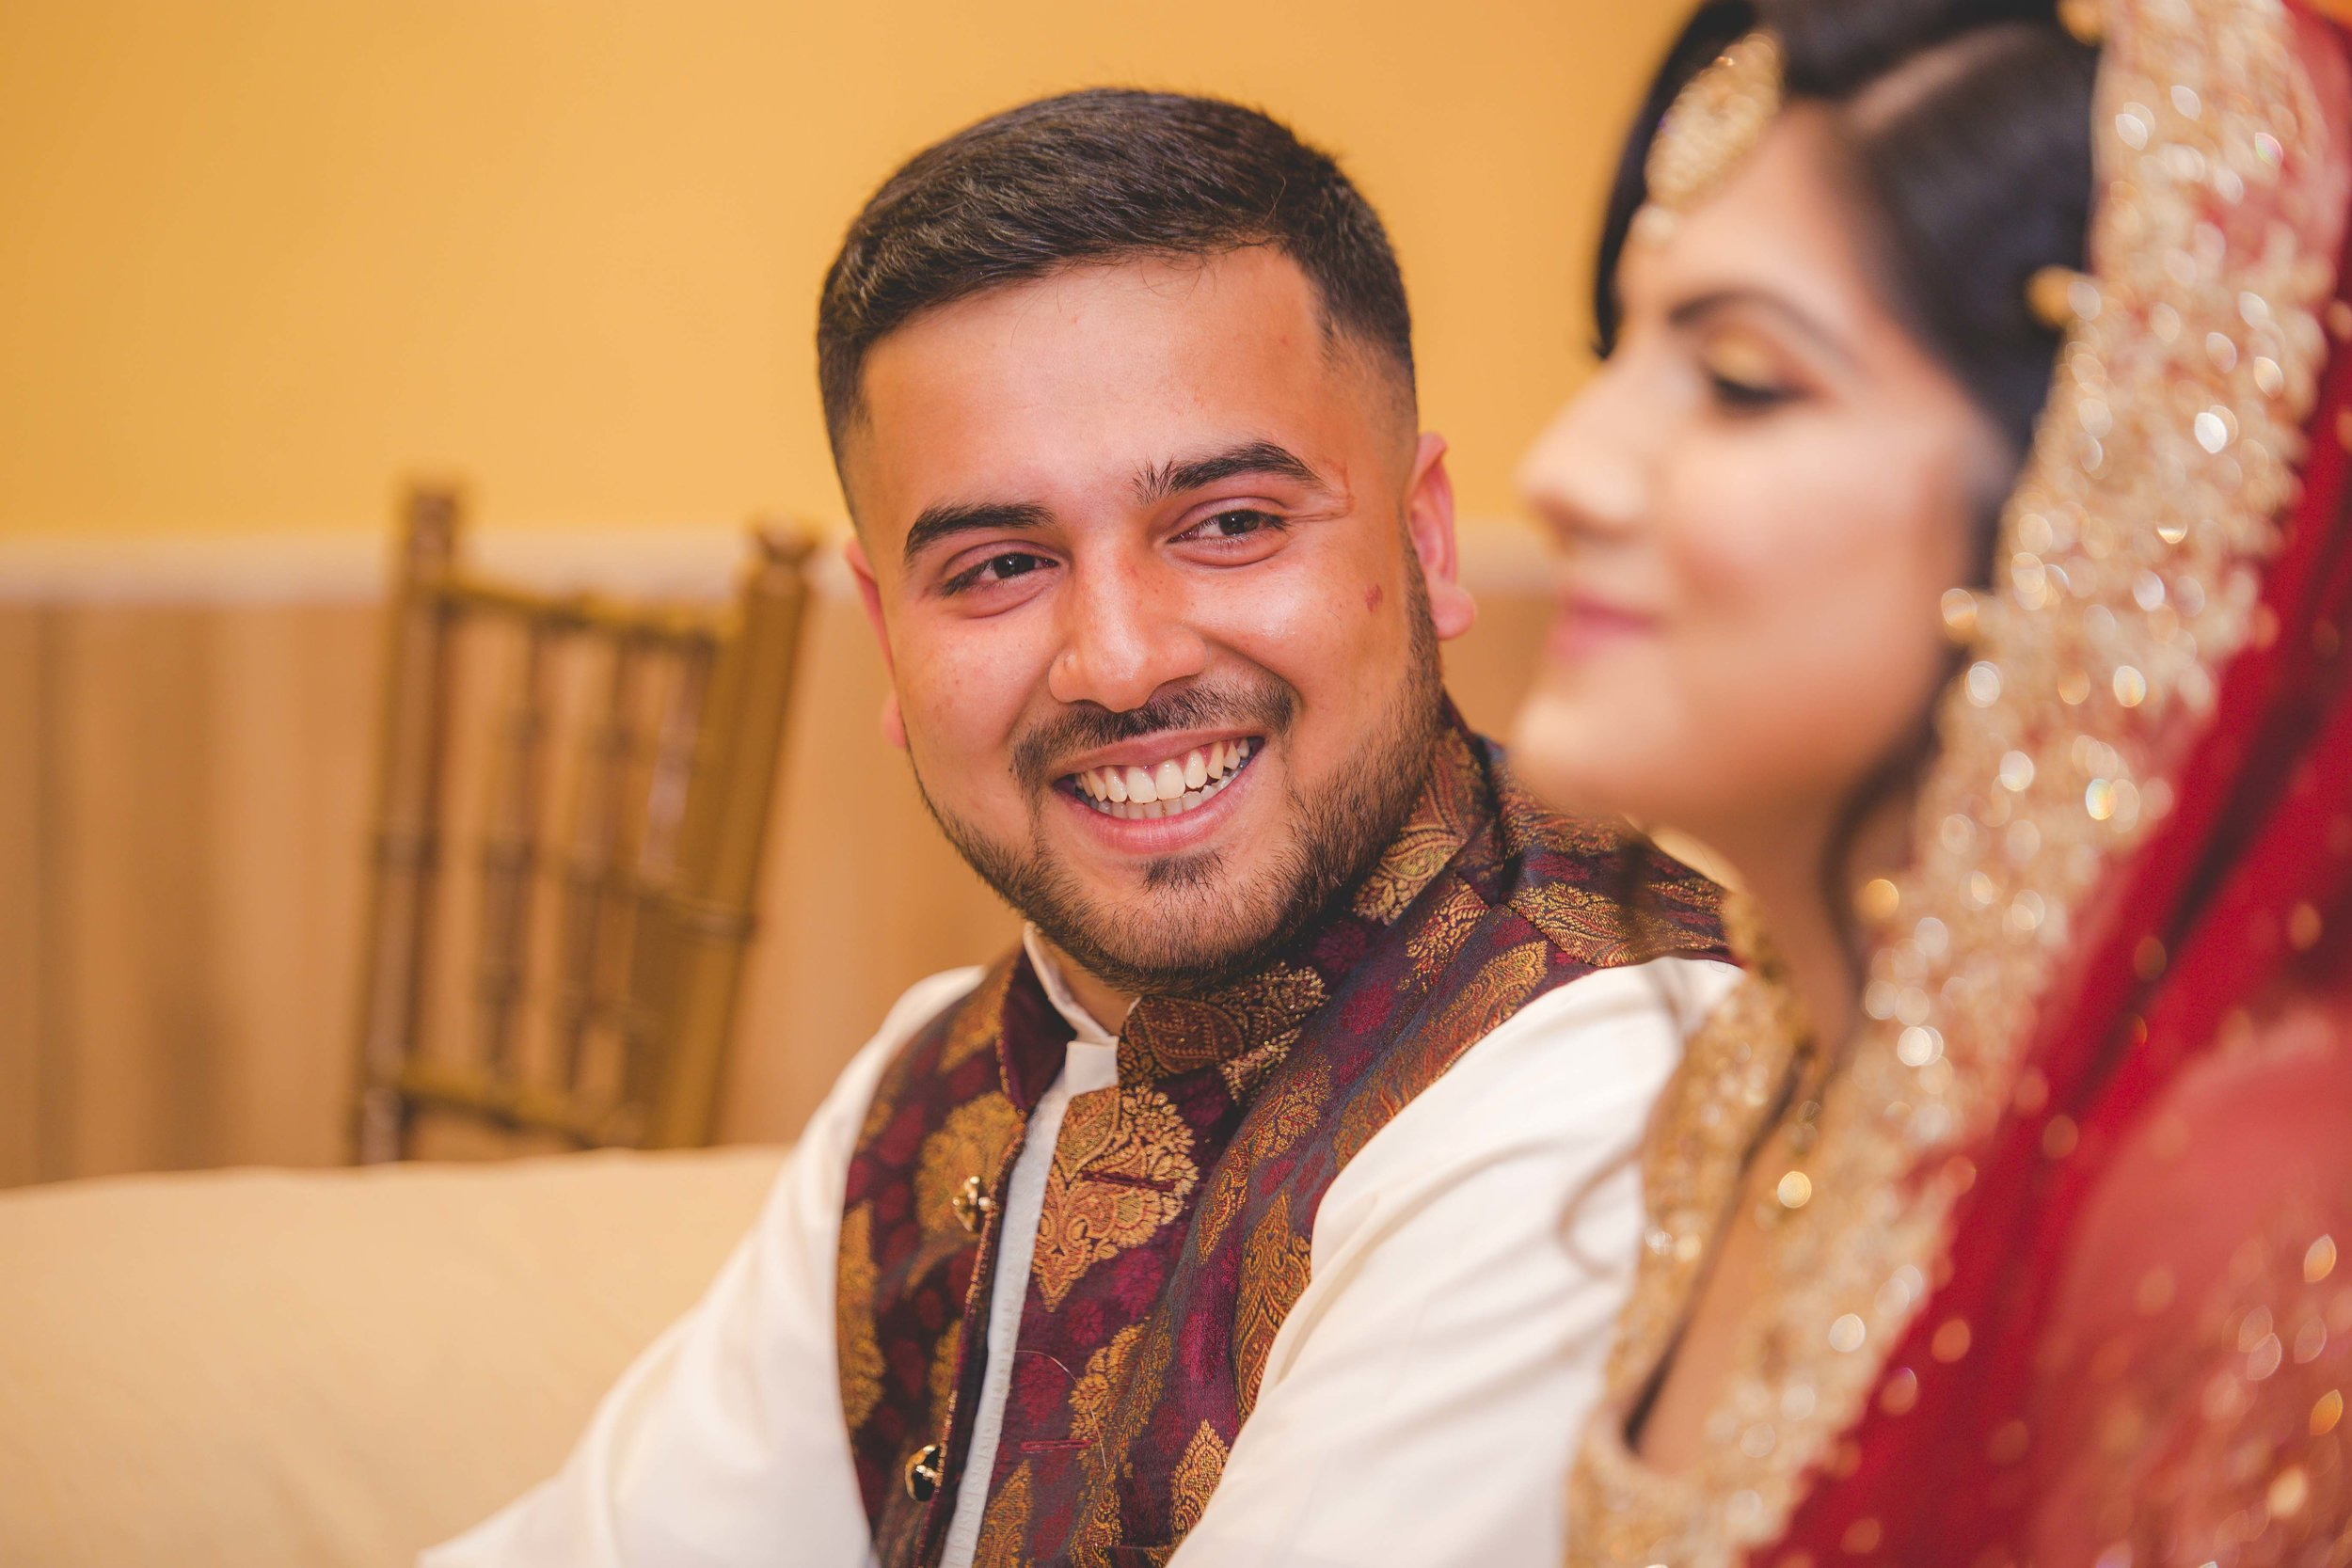 pakistani-wedding-photographer-brooklyn-new-york-17.jpg